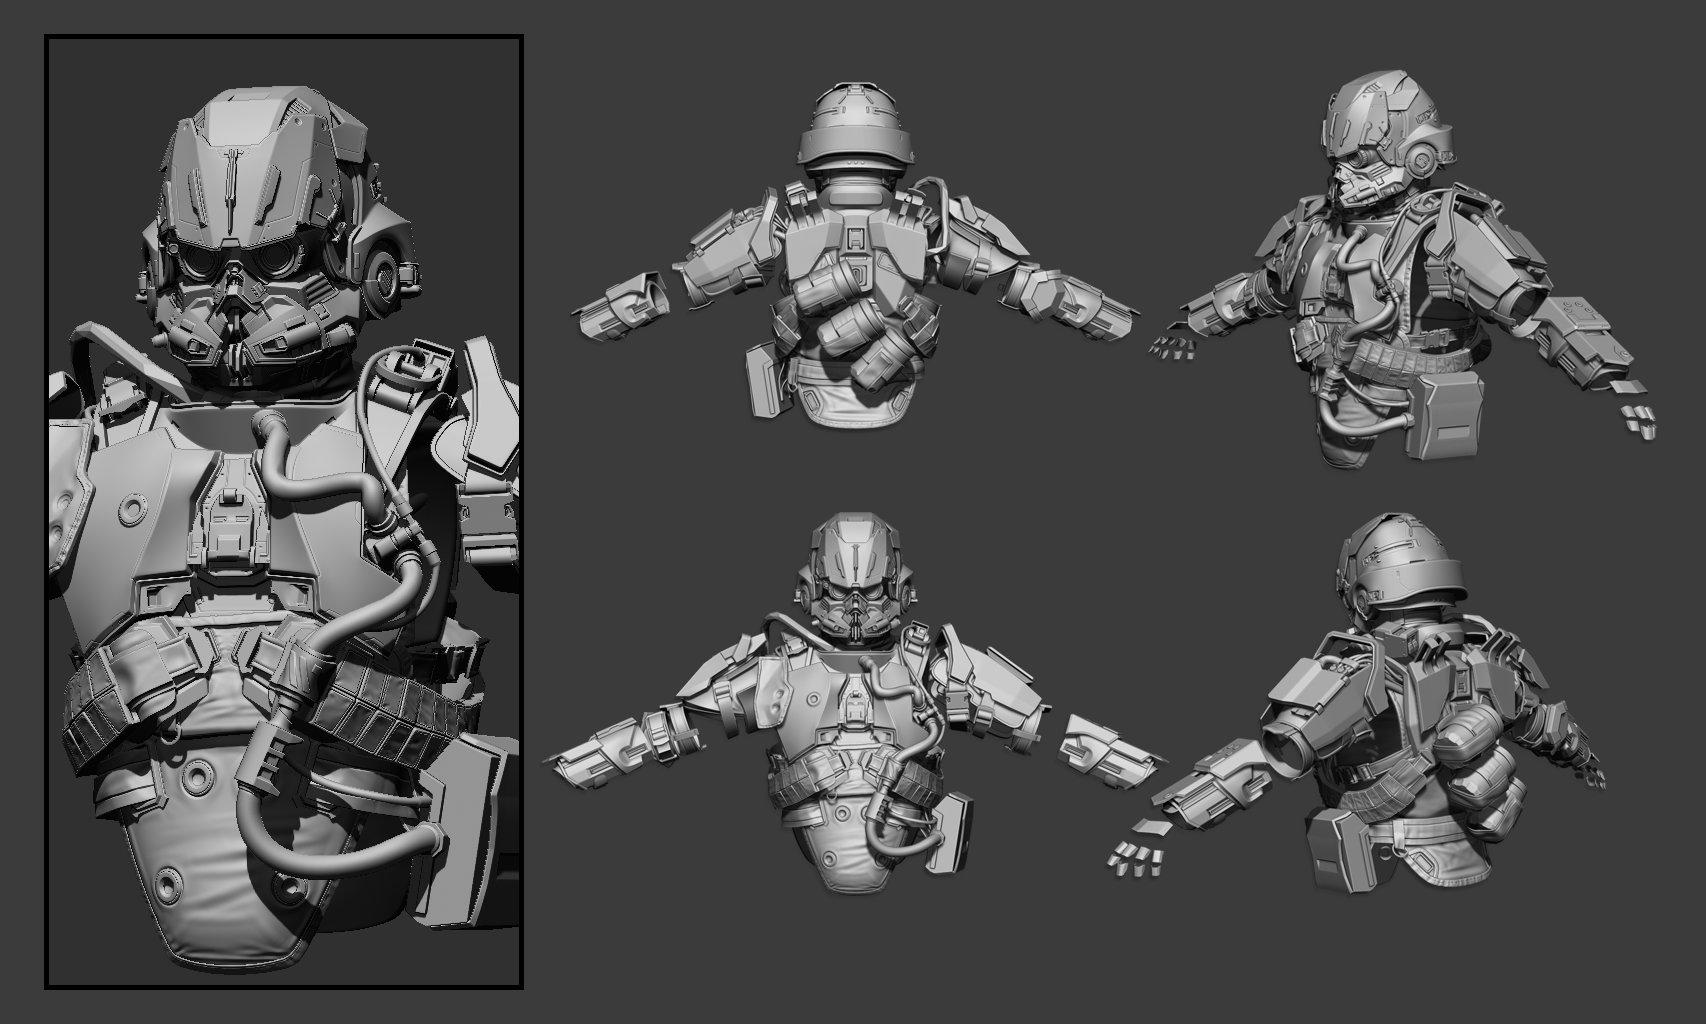 Rudy massar 1 helghast trooper 4